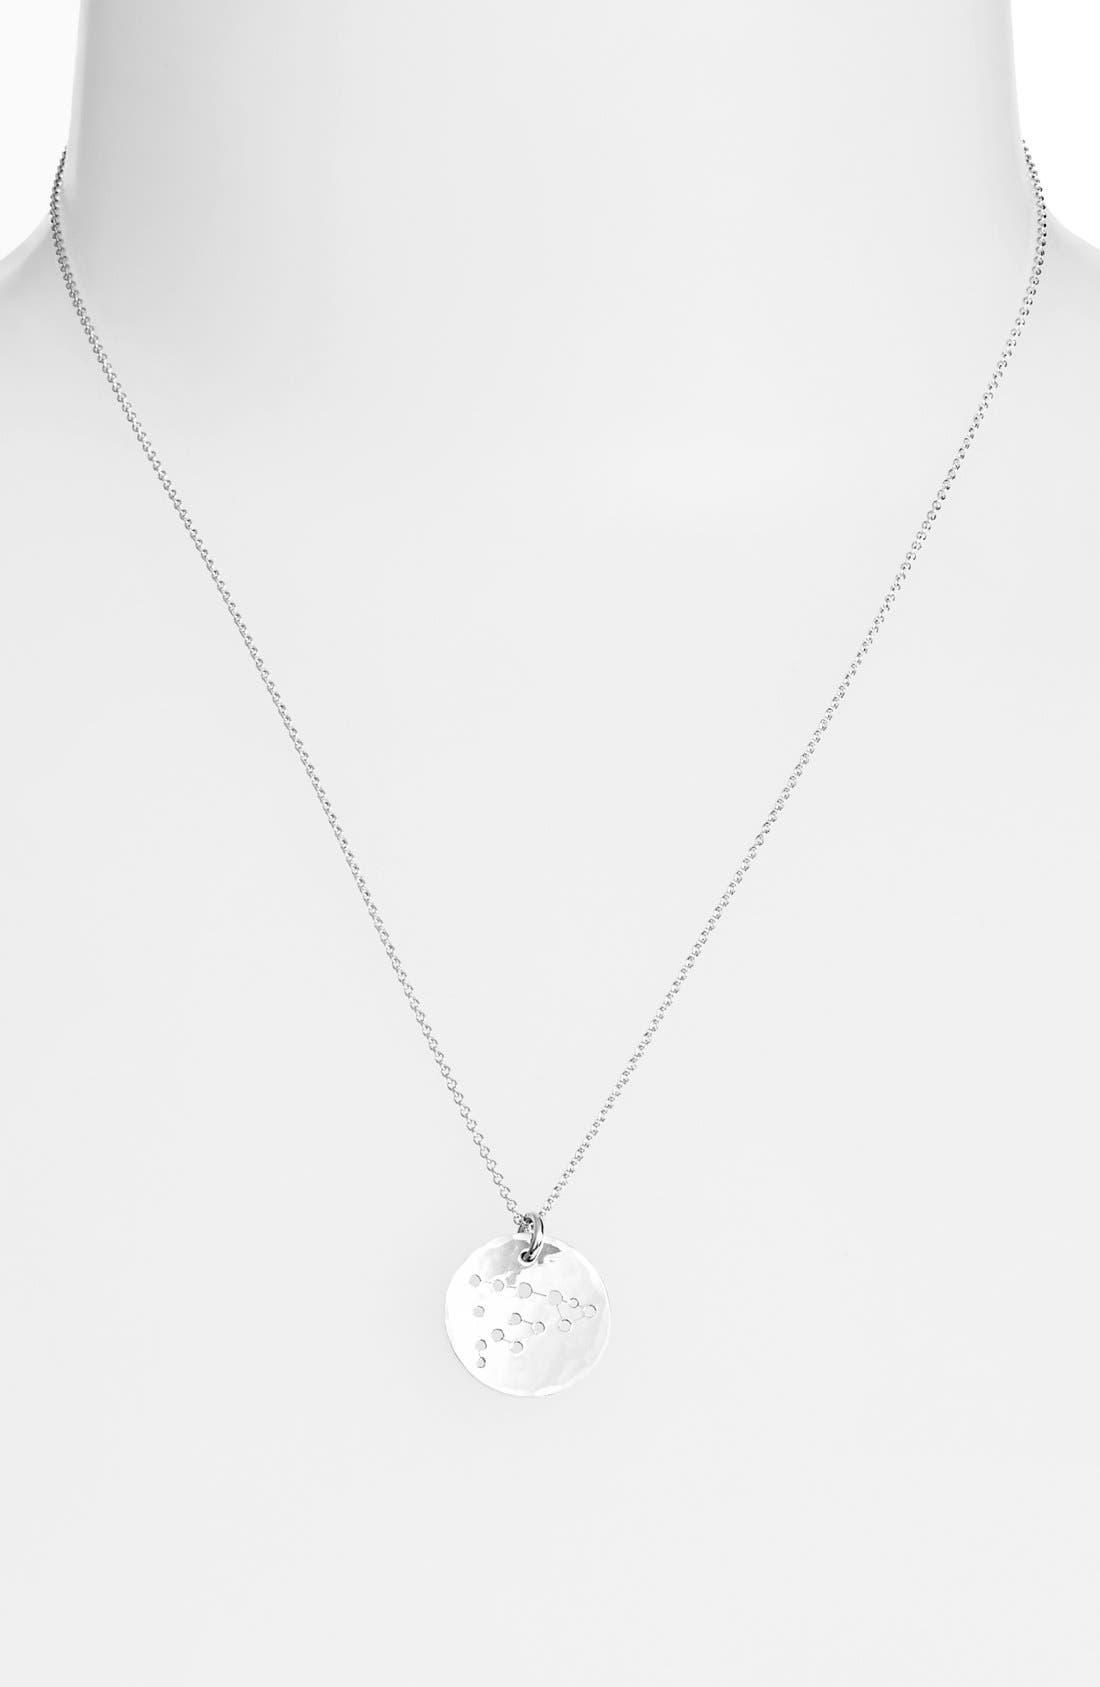 Ija 'Small Zodiac' Sterling Silver Necklace,                             Main thumbnail 11, color,